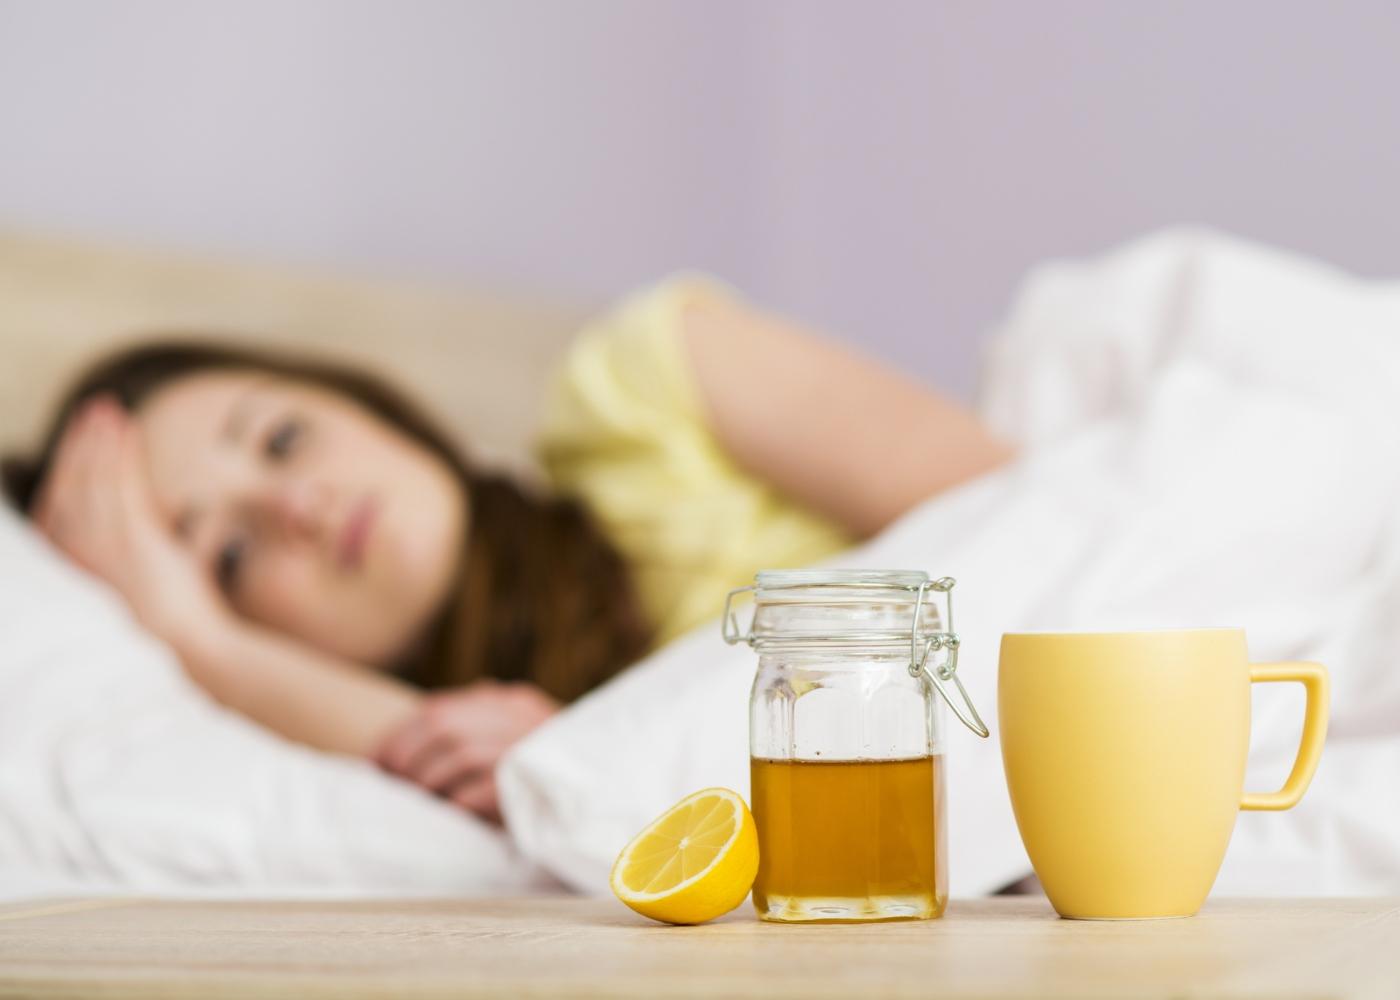 Menina com gripe deitada na cama